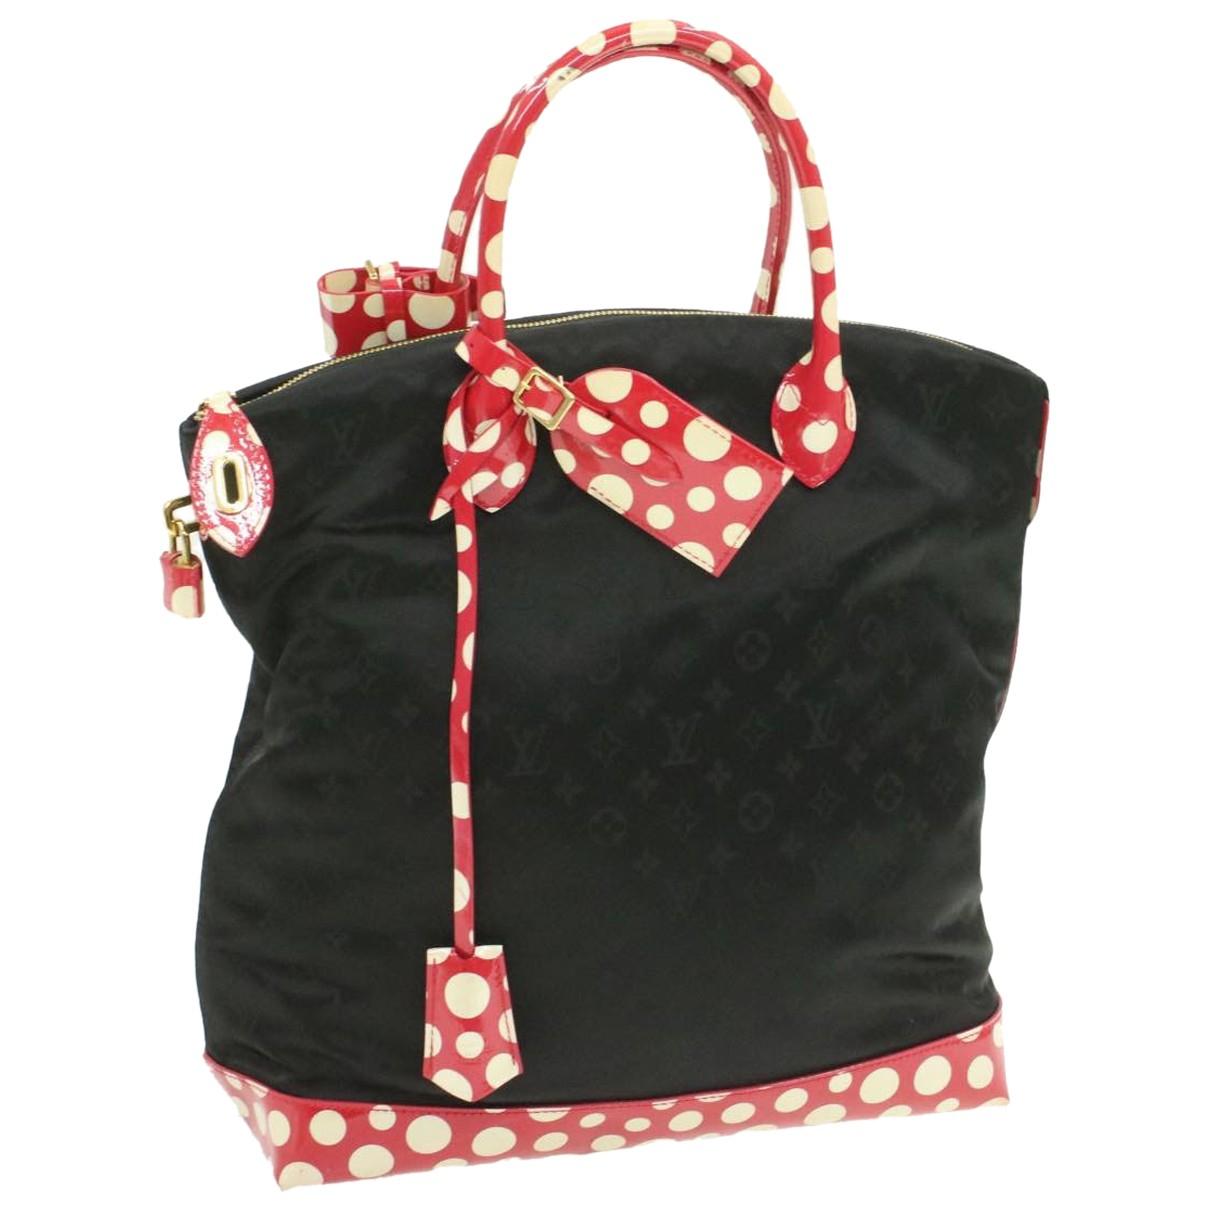 Louis Vuitton Lockit Vertical Black Cloth handbag for Women N